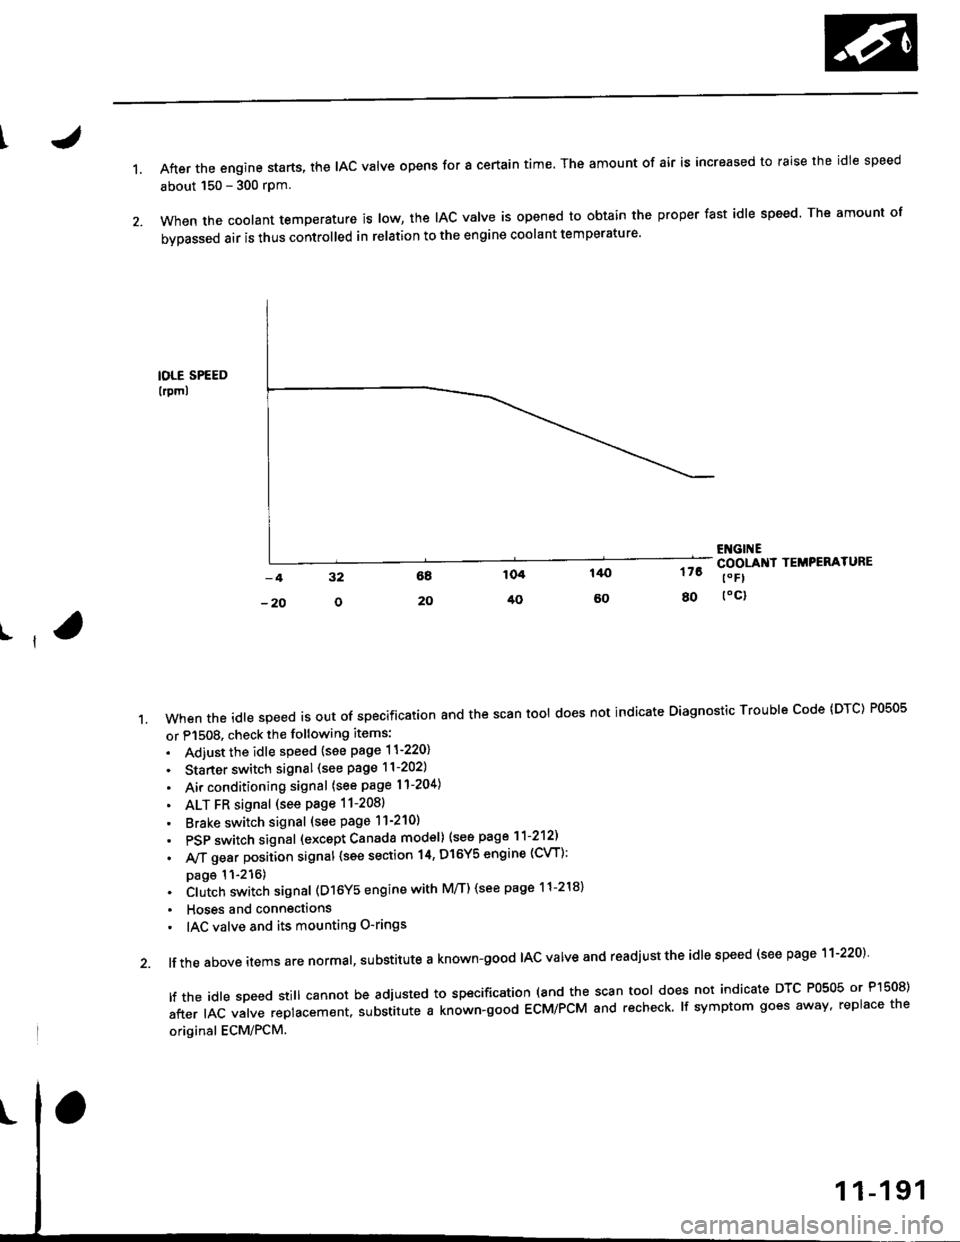 Engine Coolant Honda Civic 1998 6g Workshop Manual Primary Heated Oxygen Sensor Ho2ssensor 1 Heater Circuit Page 460